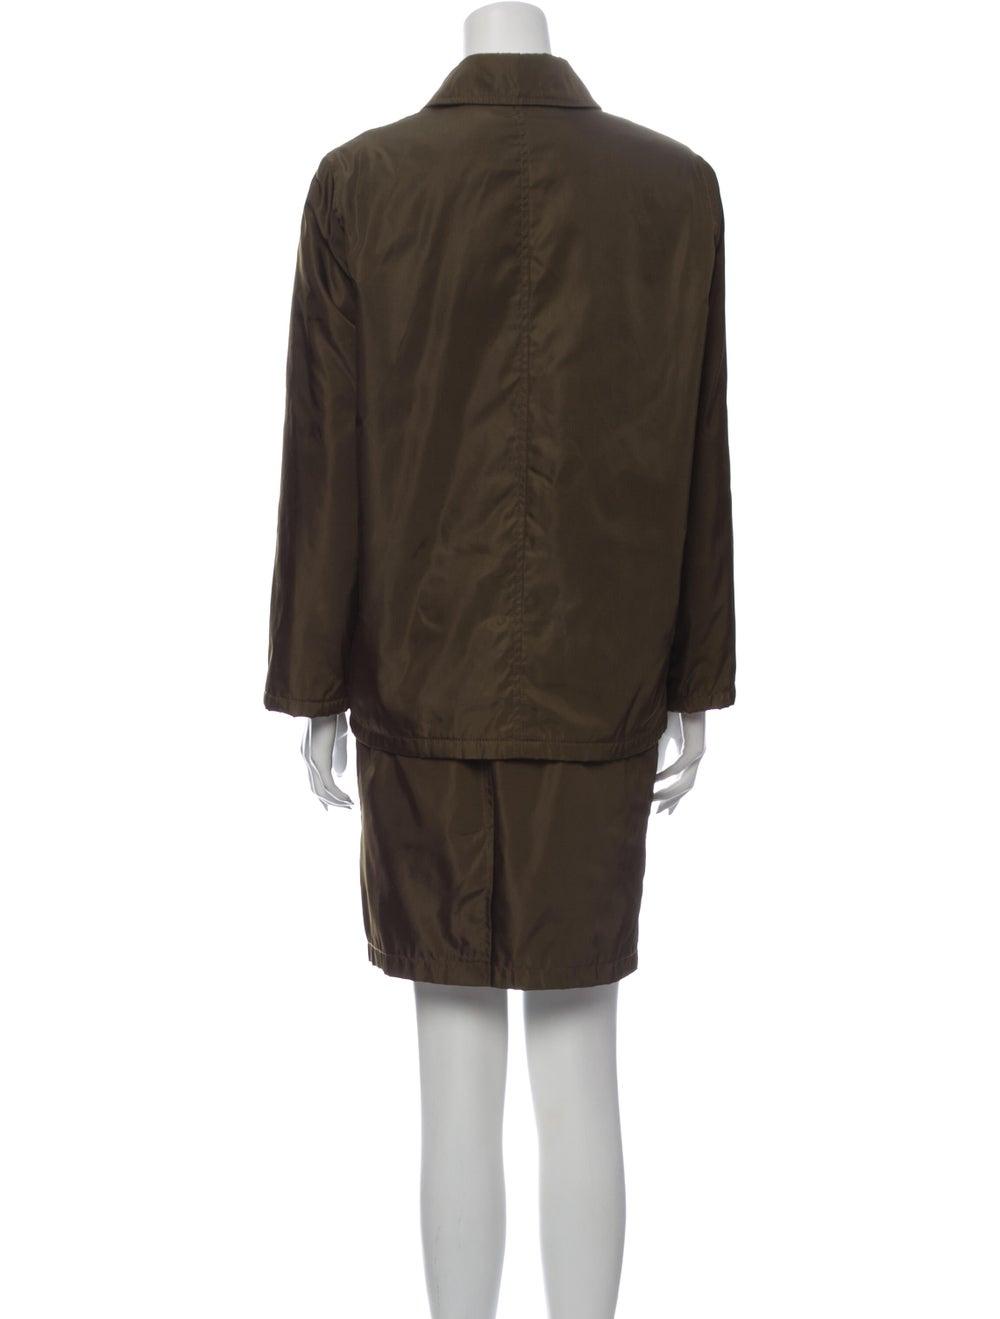 Prada Skirt Suit Green - image 3